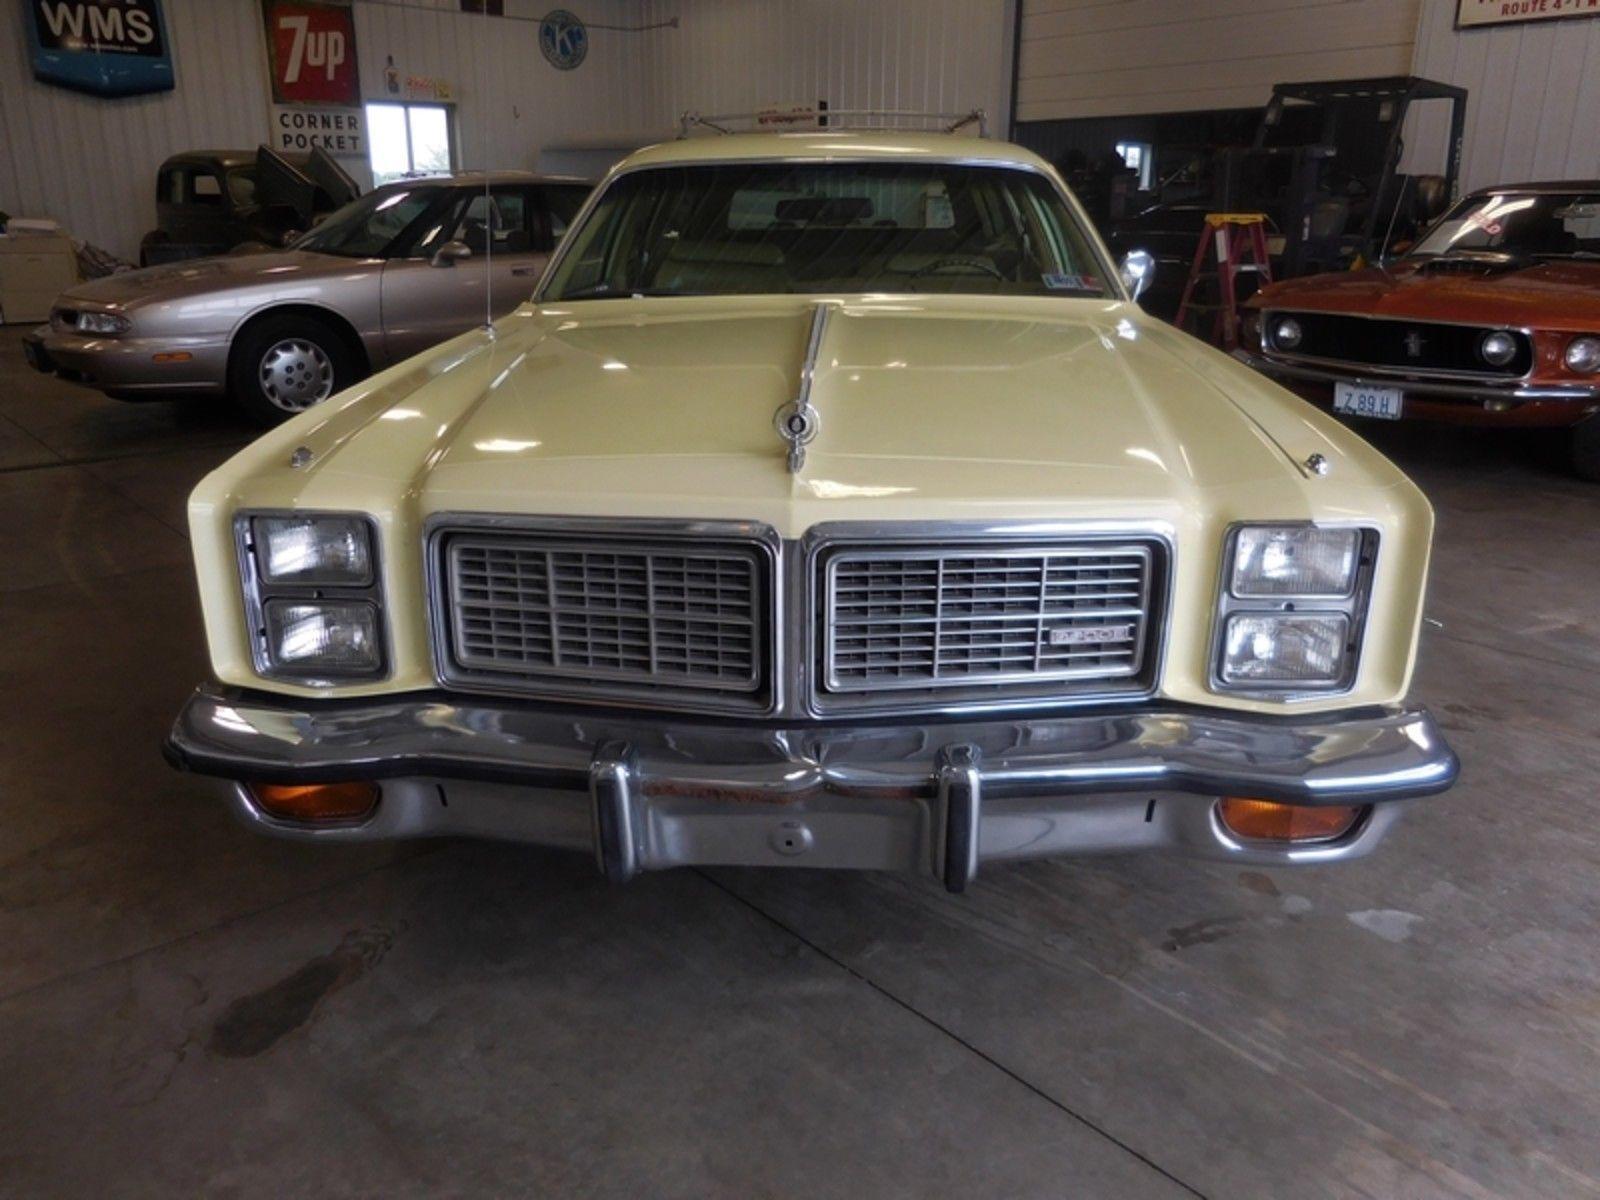 1977 Dodge Monaco | eBay